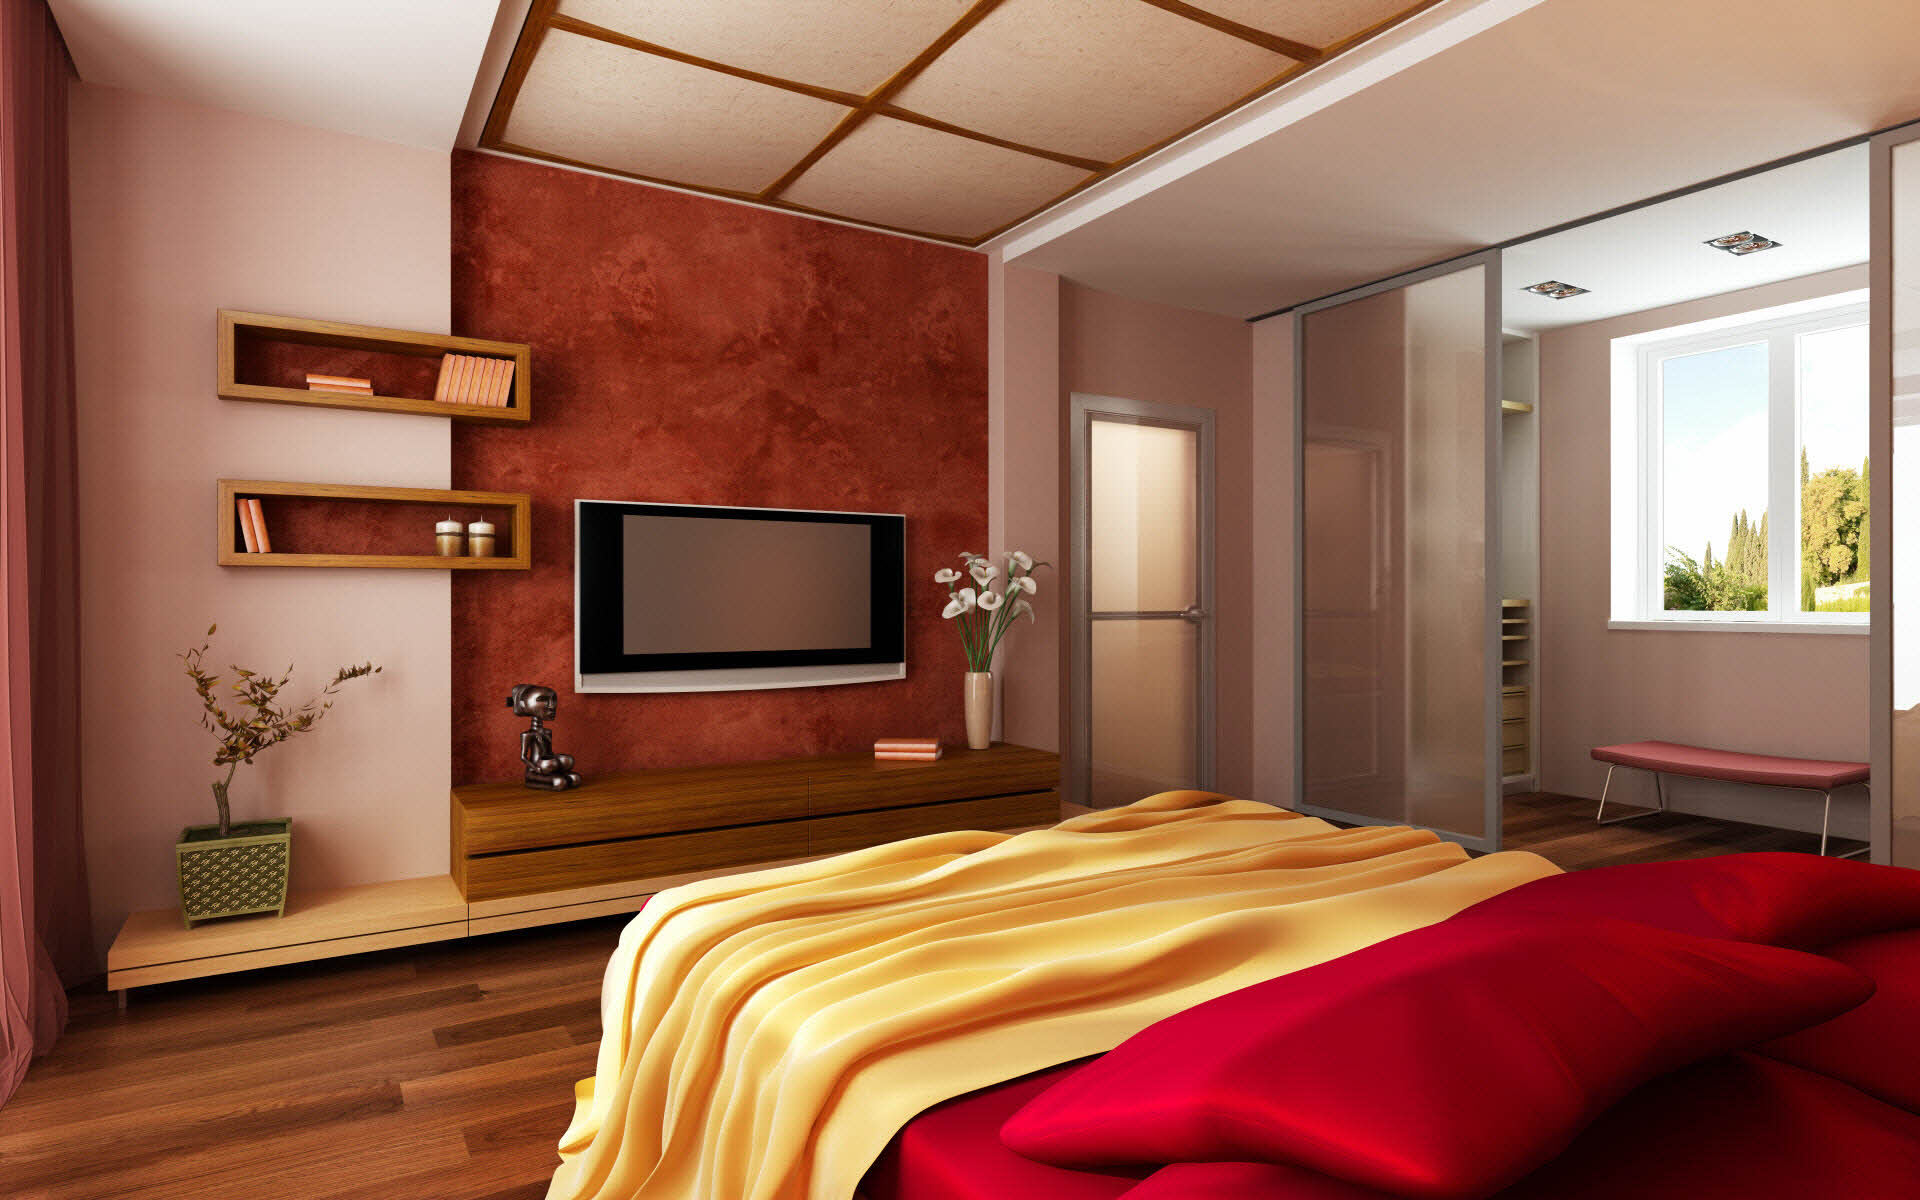 Schlafzimmergestaltung  Schlafzimmergestaltung